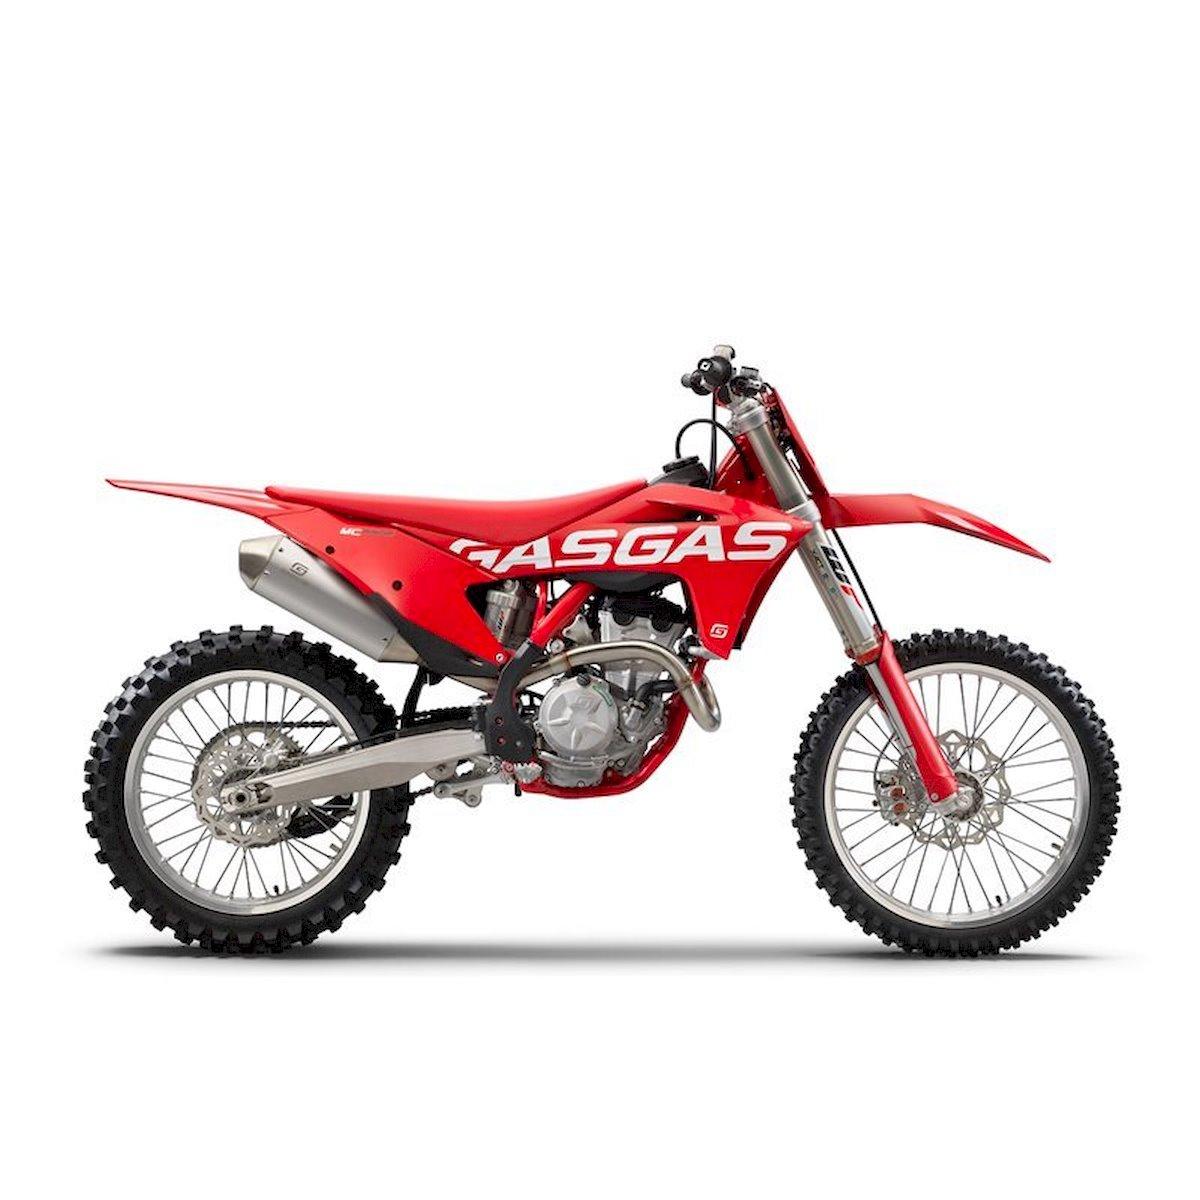 Image of GAS GAS MC 250